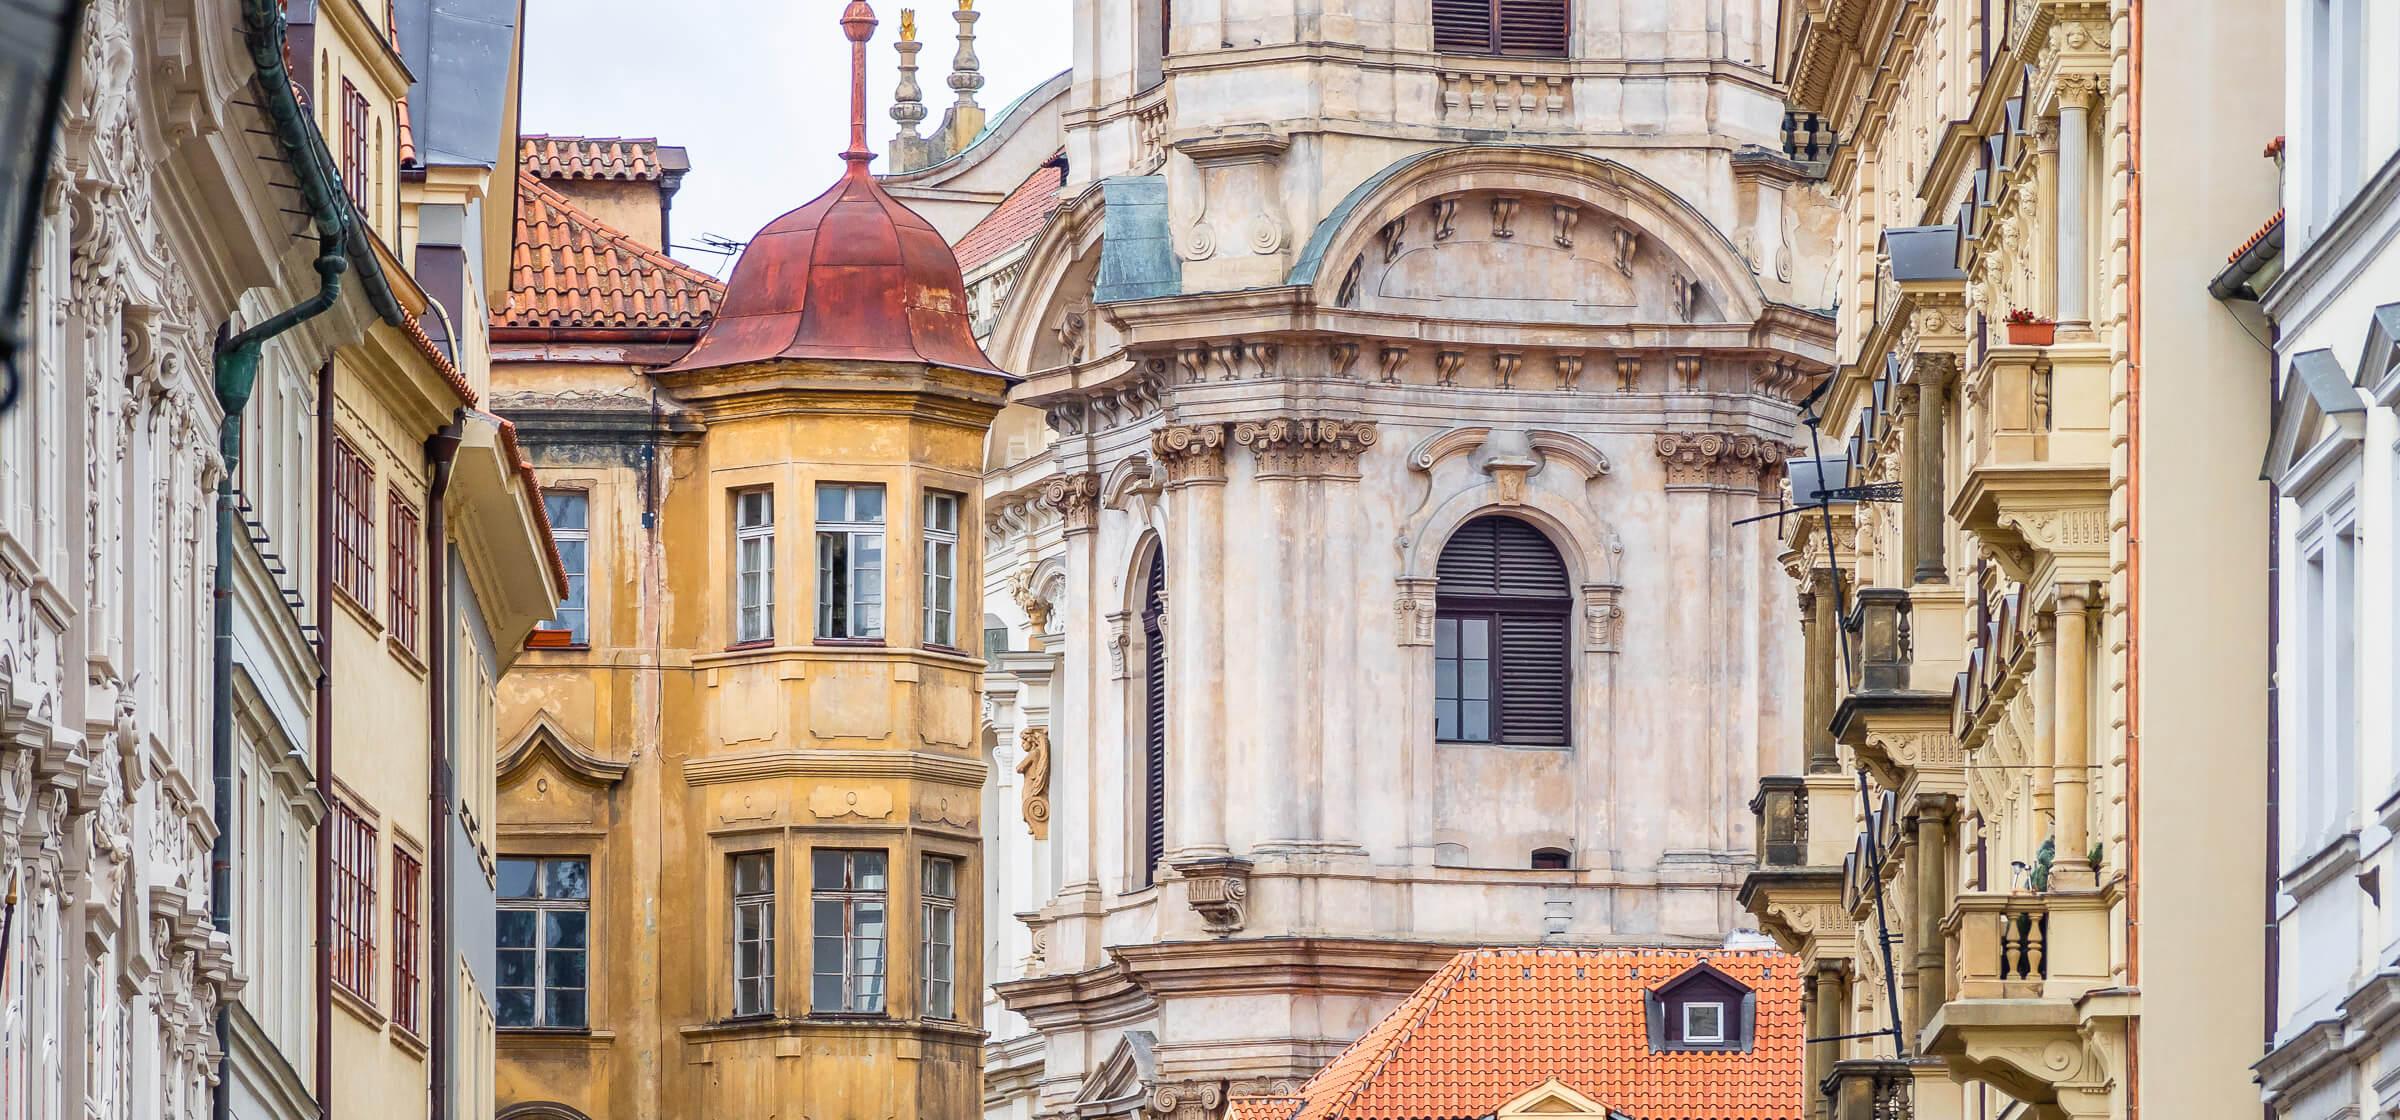 Colourful Old Buildings in Prague, Czech Republic